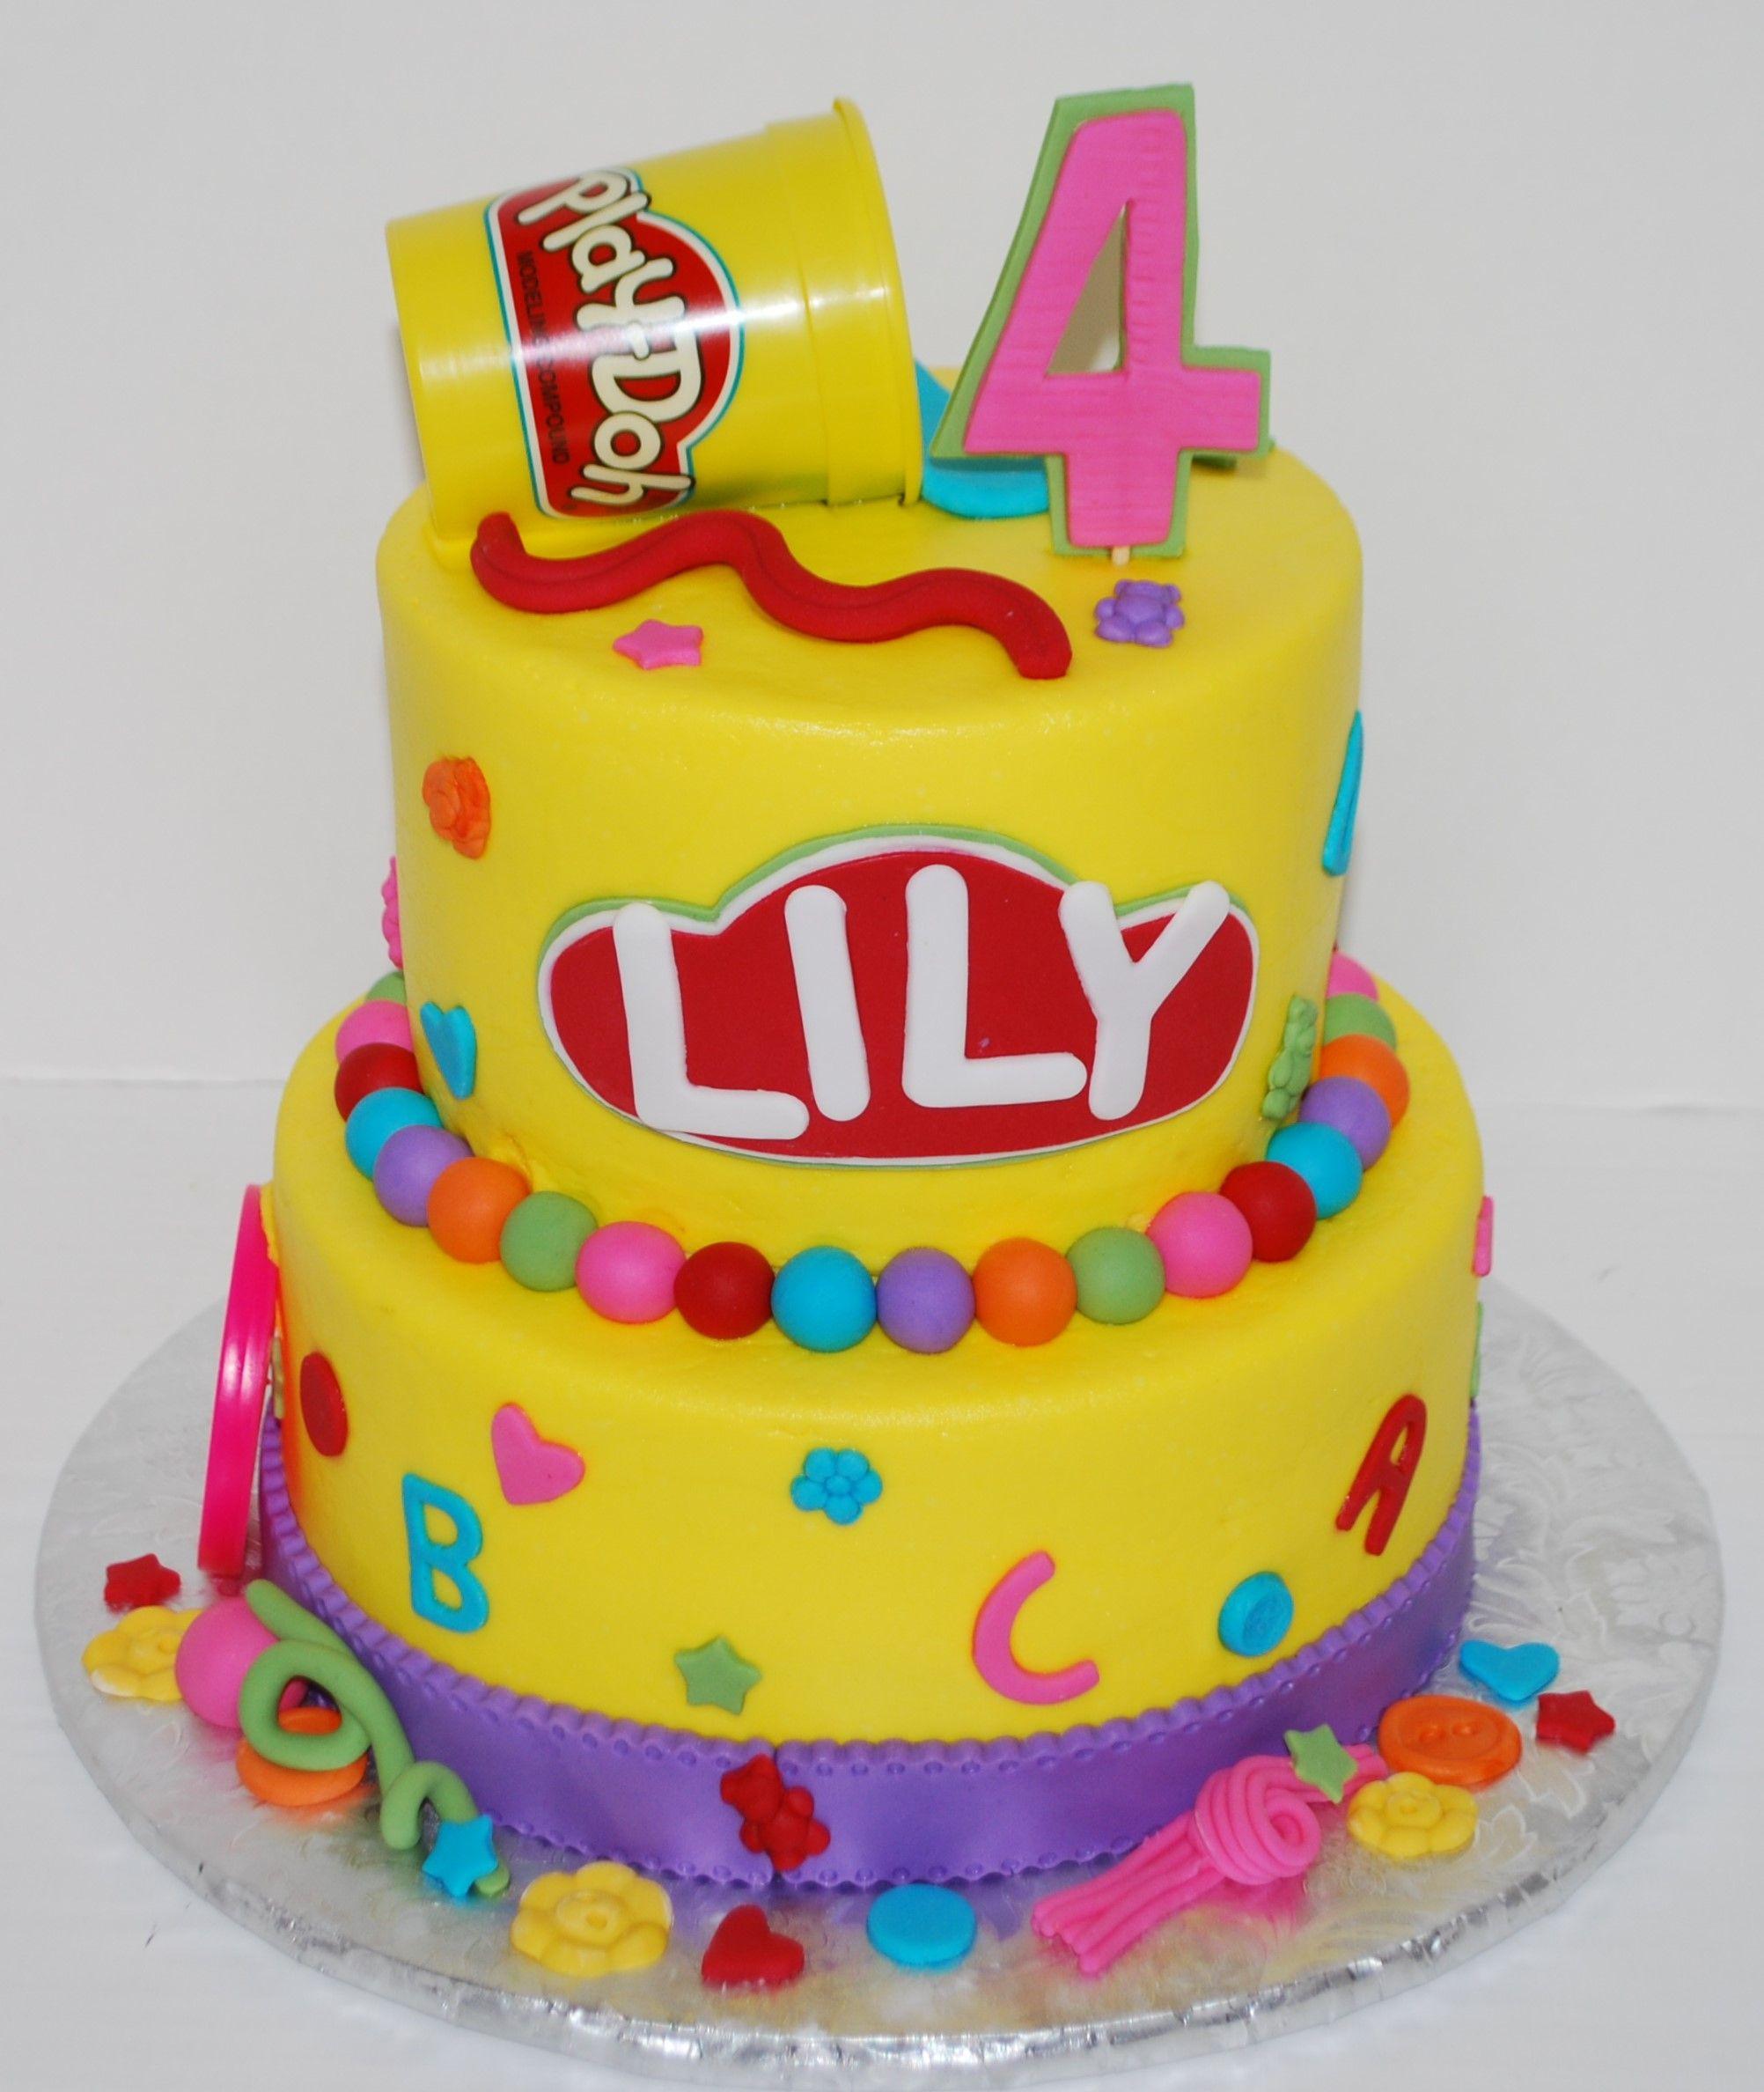 Play Doh Birthday Cake  Play Doh Theme Birthday Cake